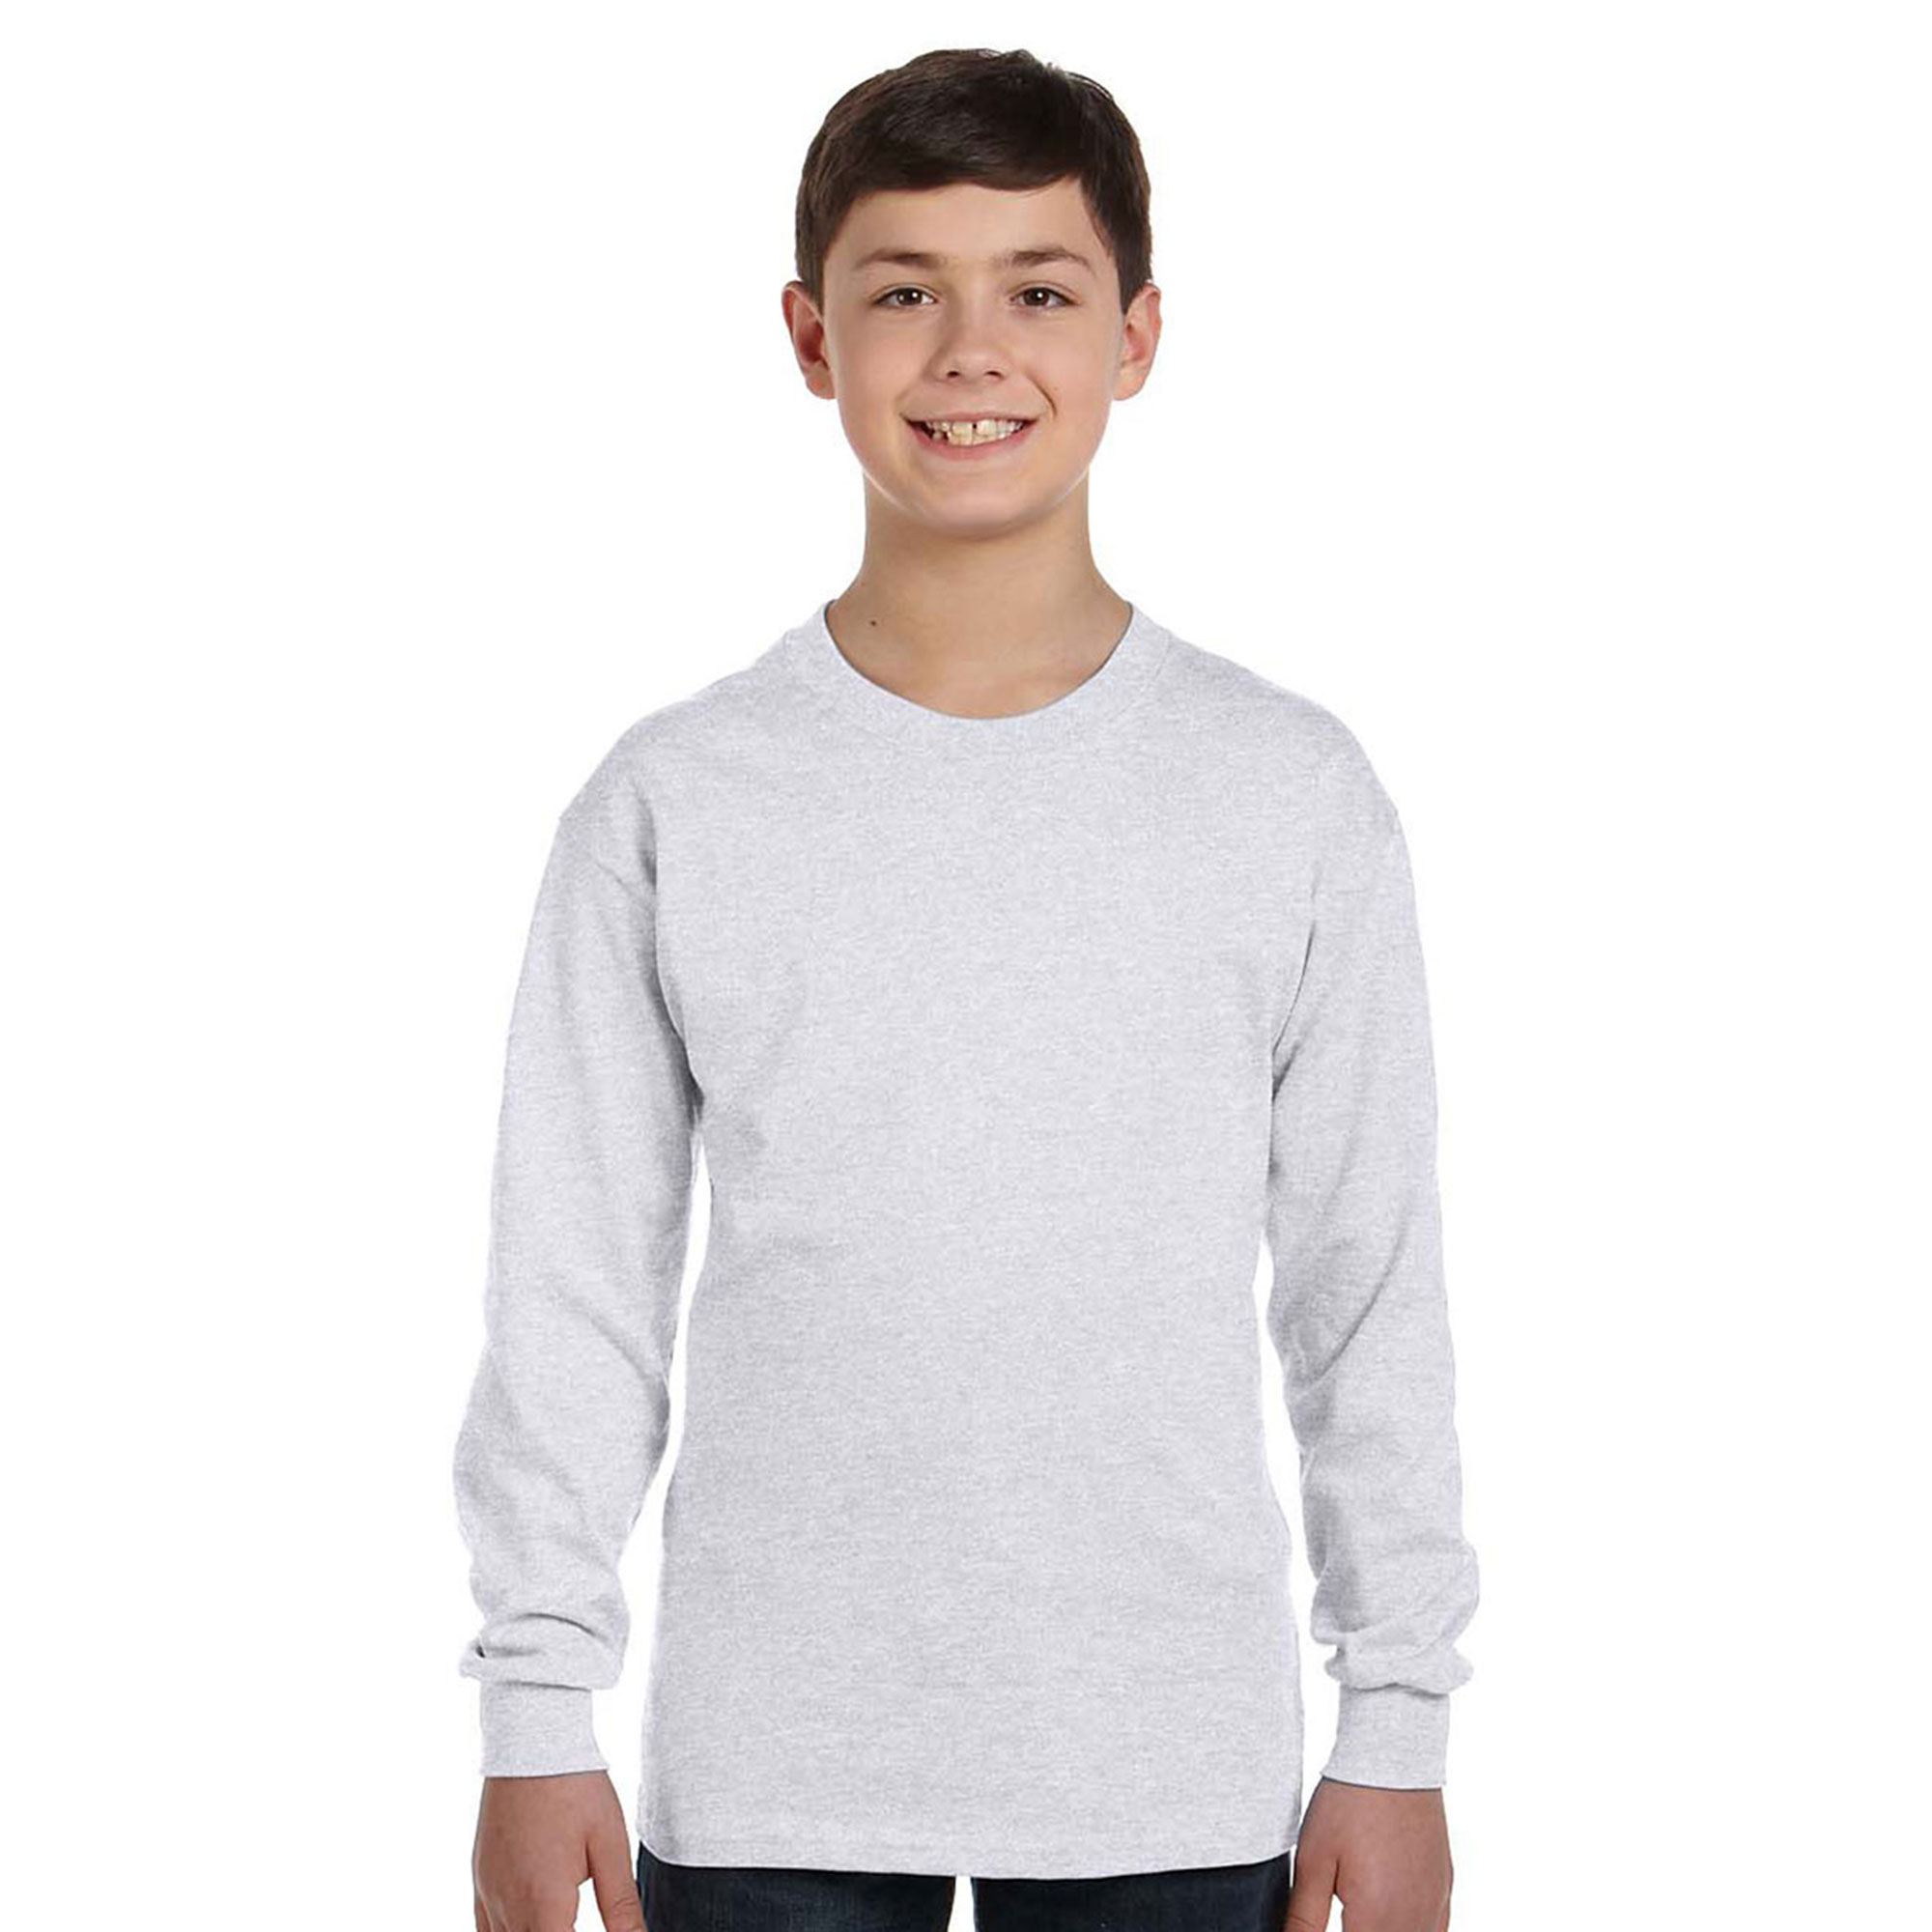 Hanes 5546 Boy's Comfort Tagless Long-Sleeve T-Shirt at Sears.com